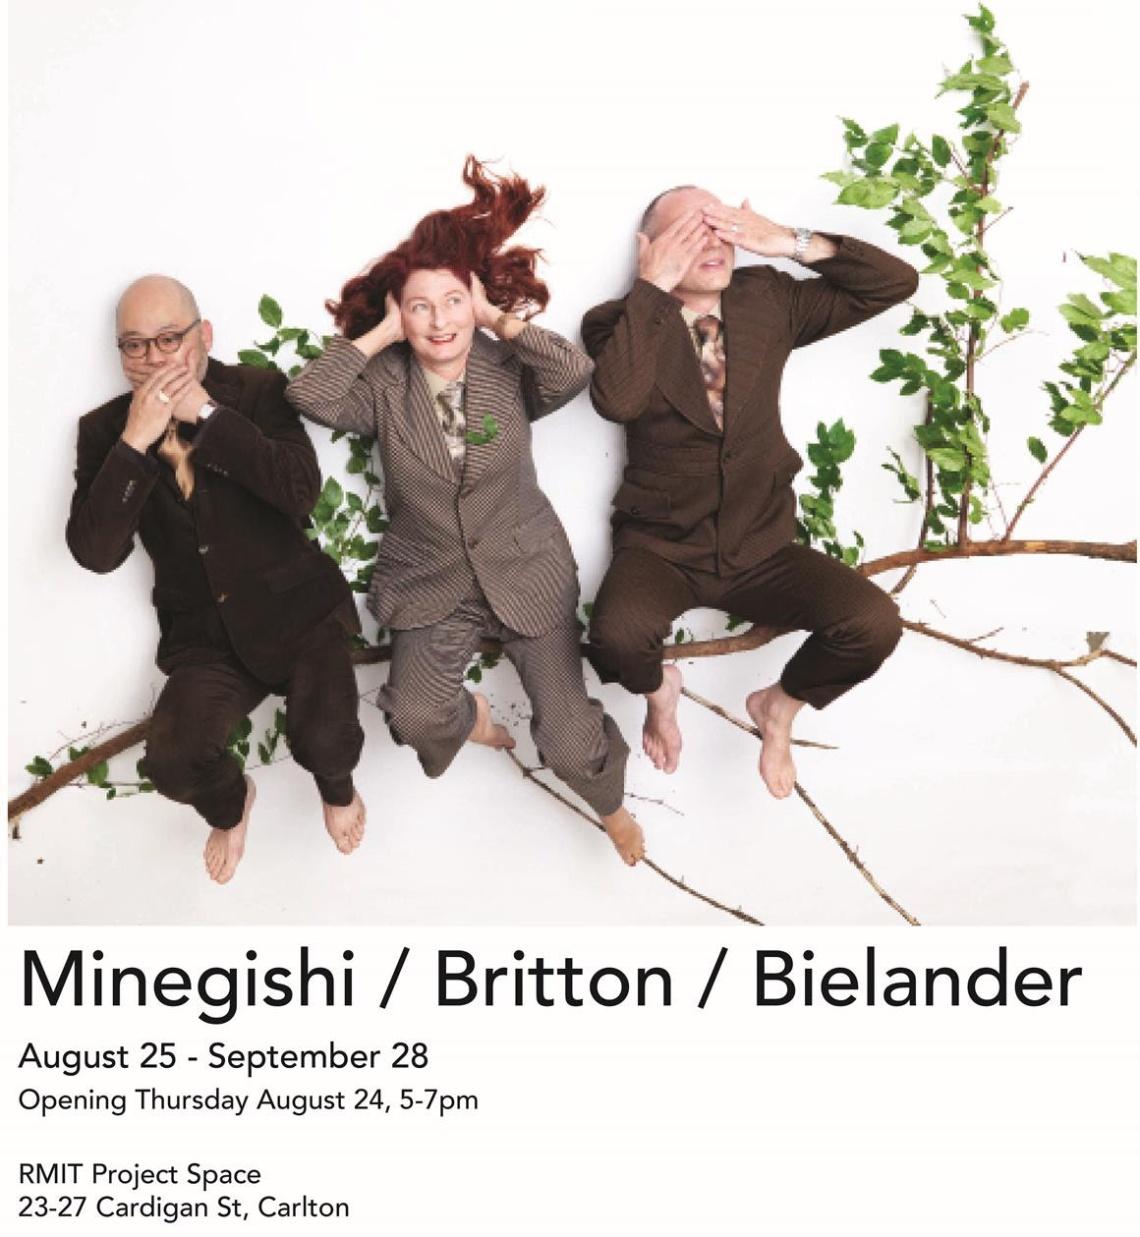 Uitnodiging Minegishi / Britton / Bielander, RMIT Project Space in samenwerking met Gallery Funaki. Foto met dank aan Gallery Funaki©